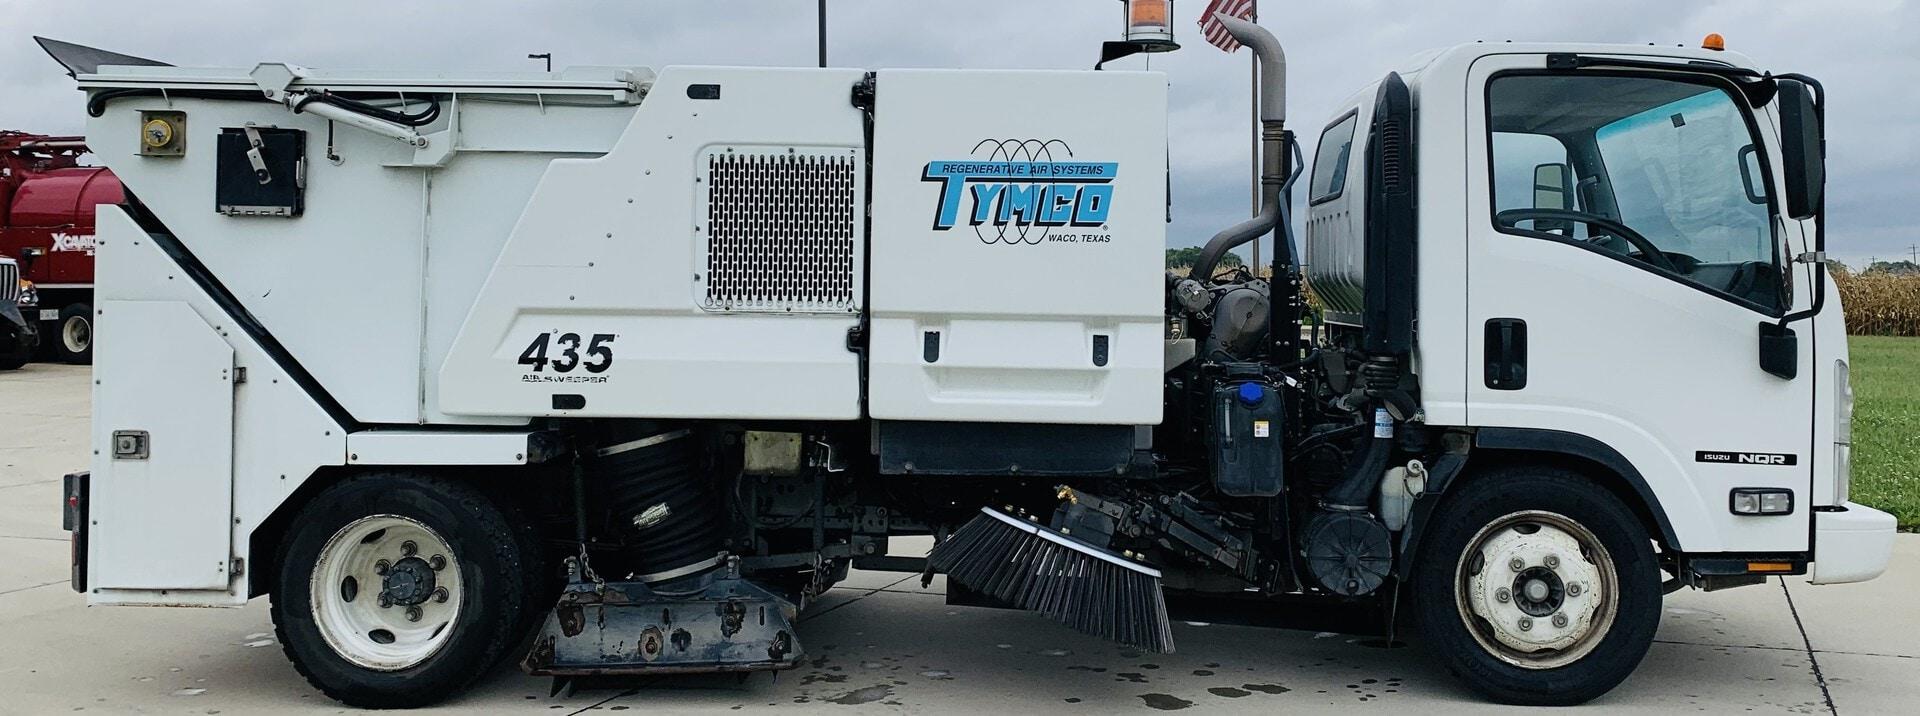 Used, 2014, Tymco, 435 Sweeper, Sweepers